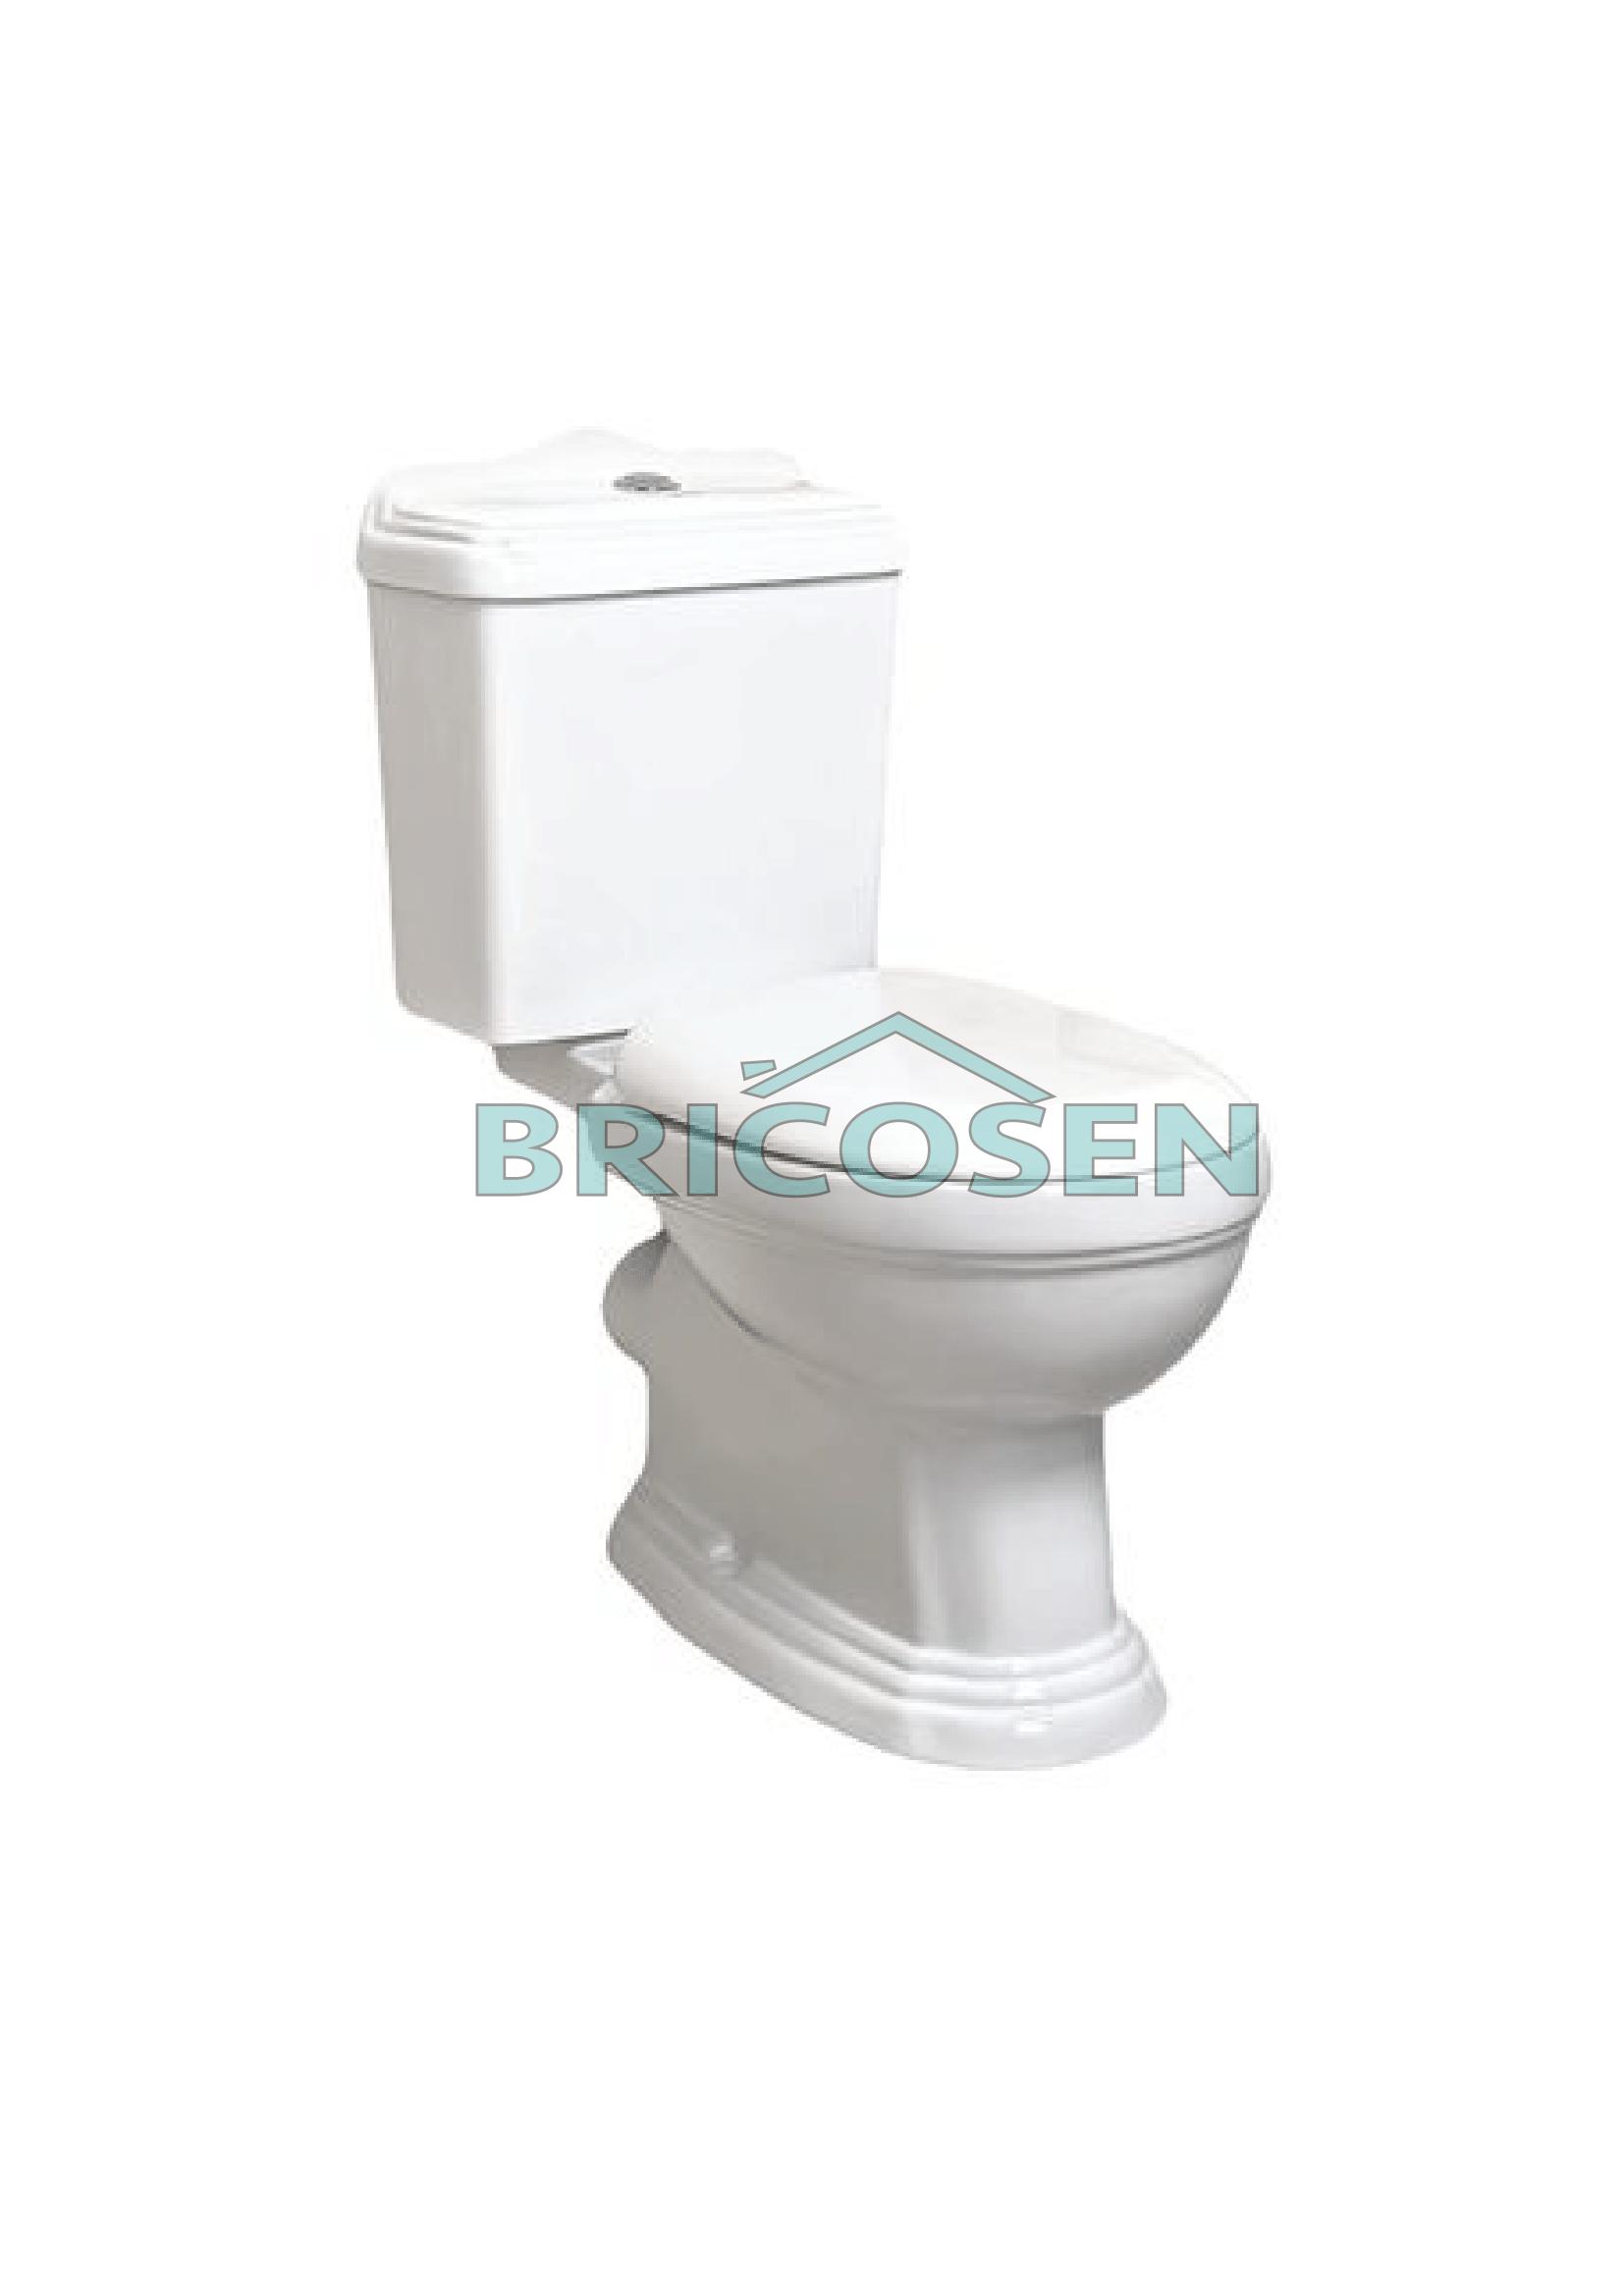 wc compact retro bricosen quincaillerie senegal 1 1